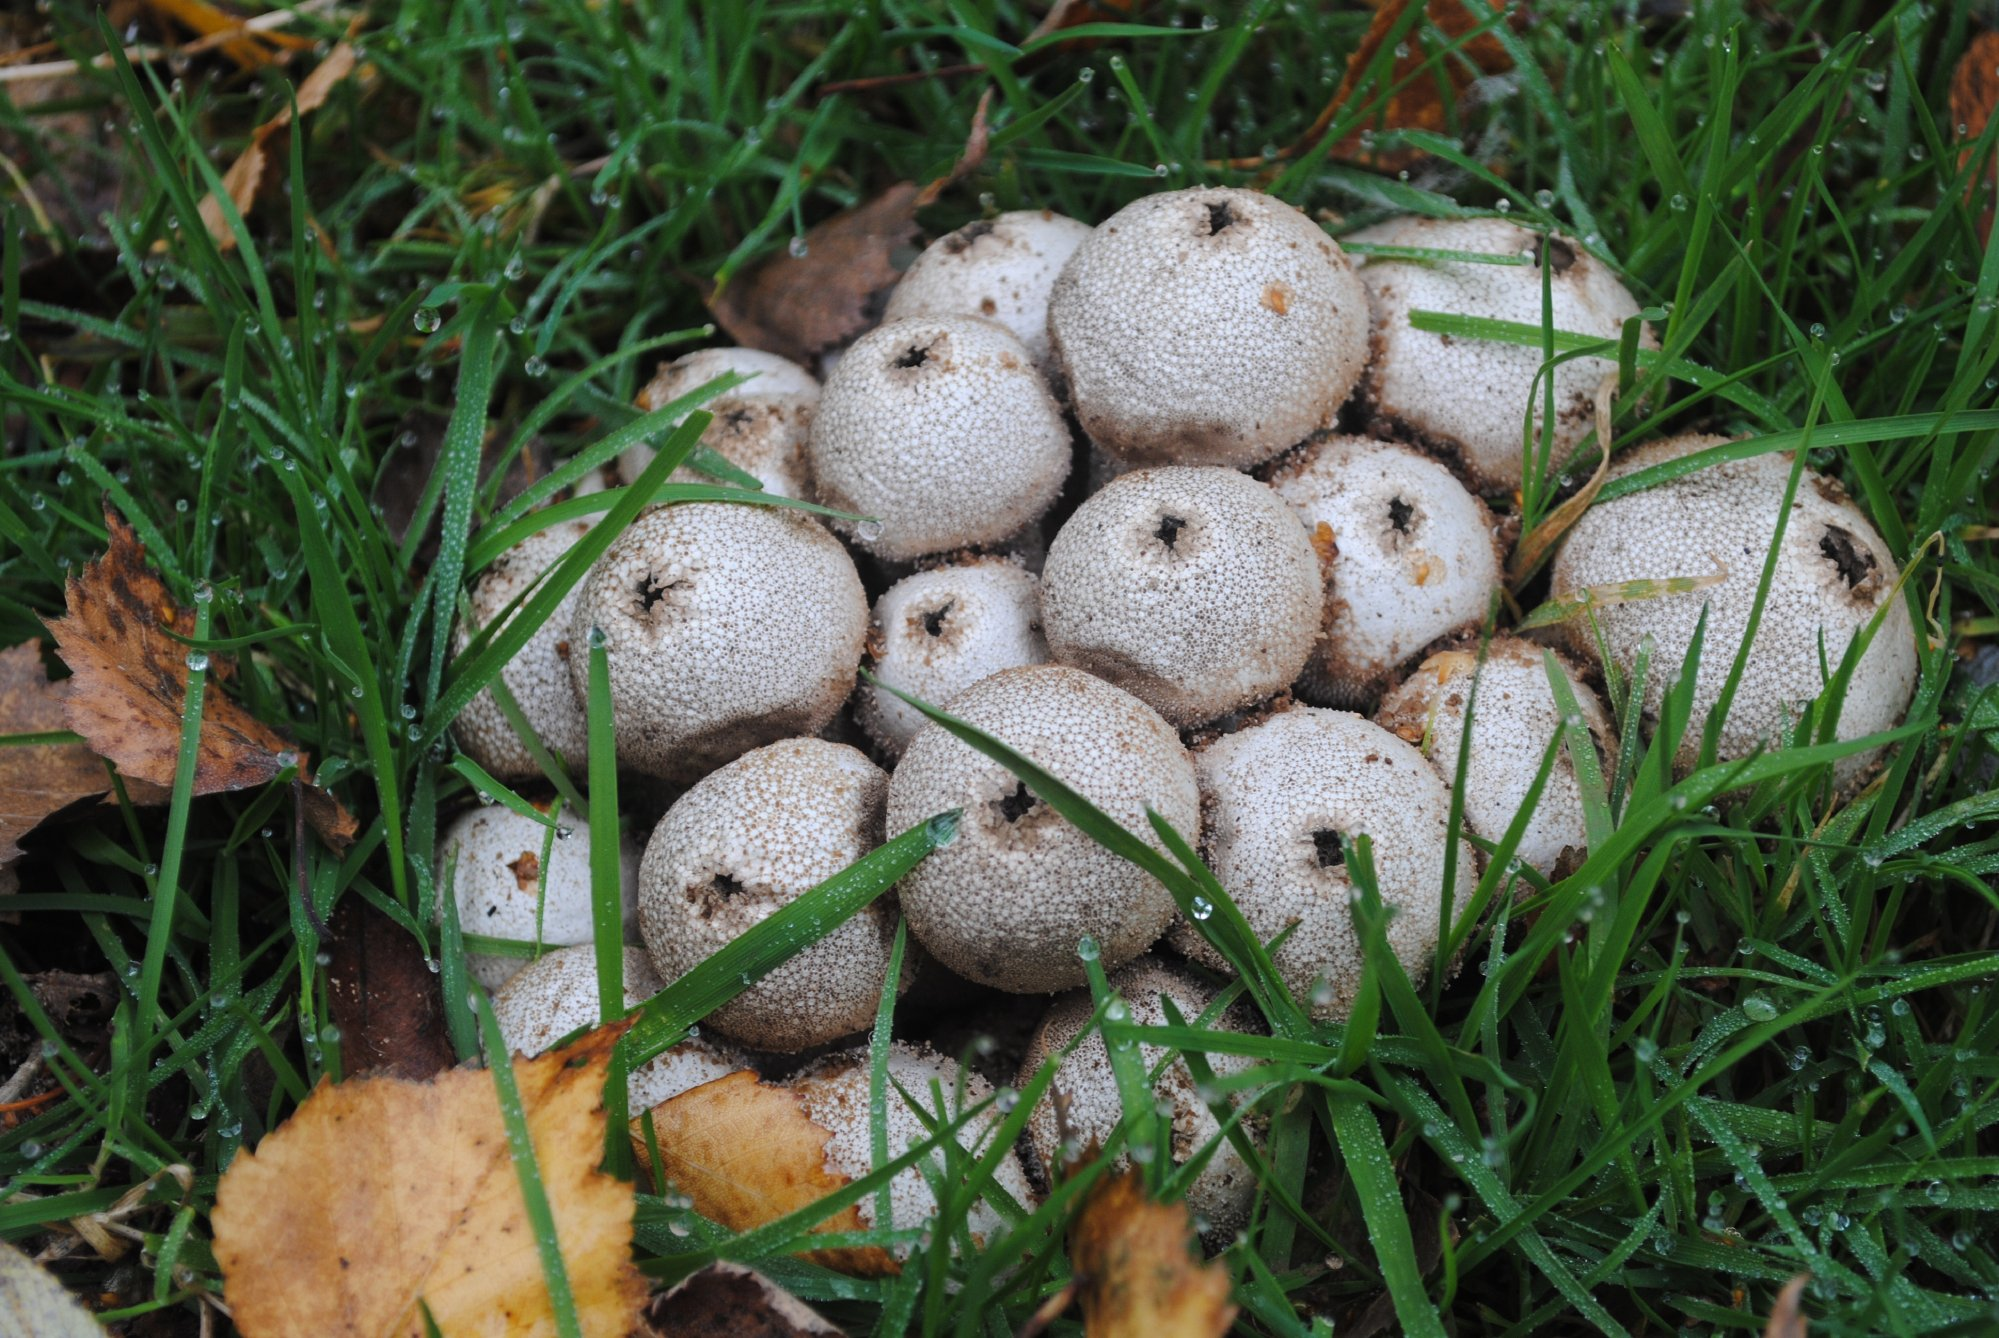 Common puffballs